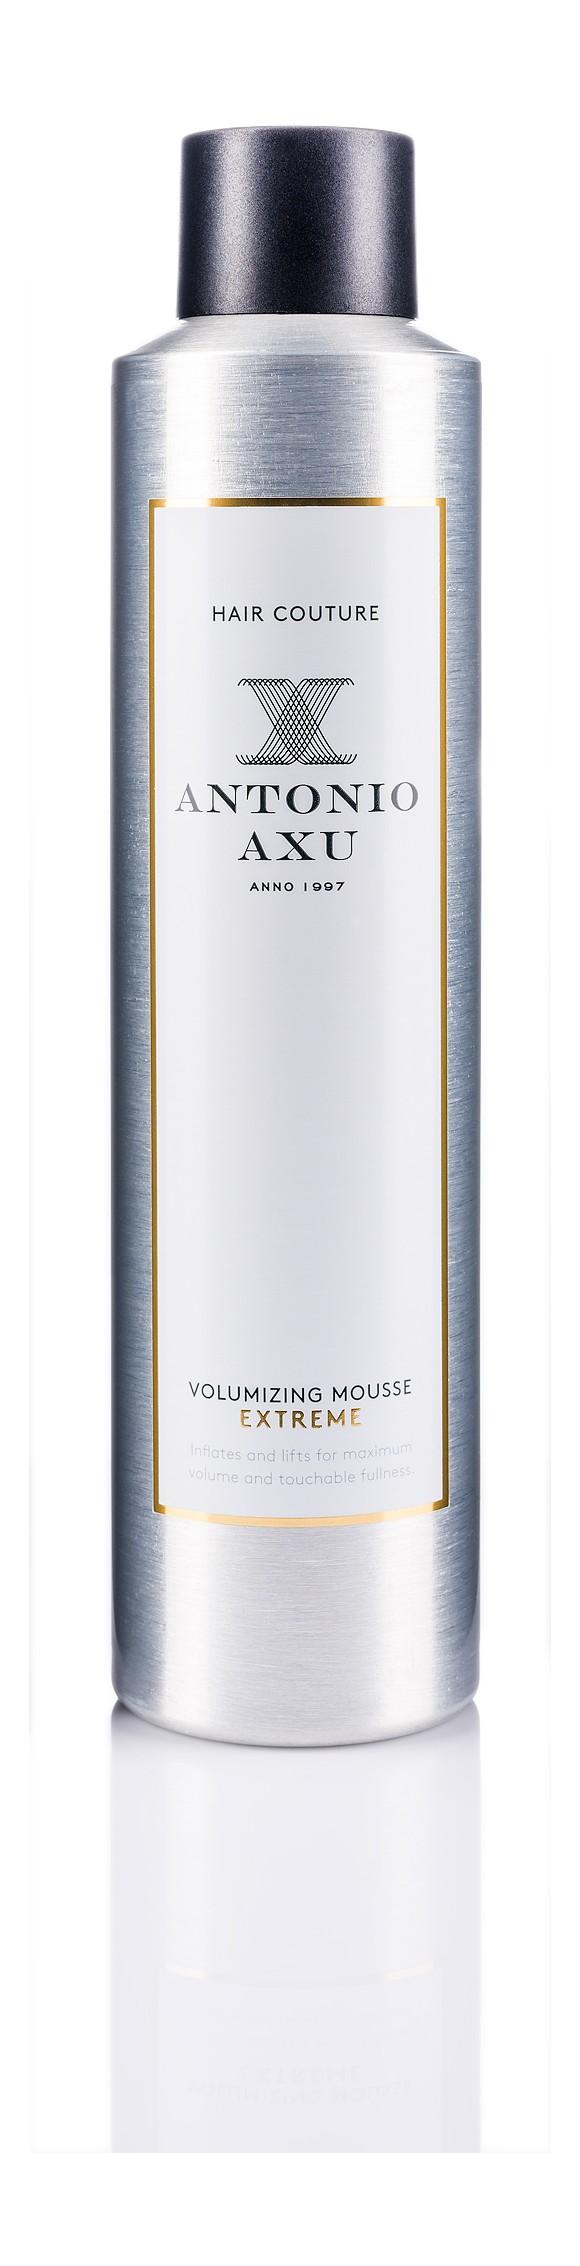 Antonio Axu - Volumizing Mousse 300 ml